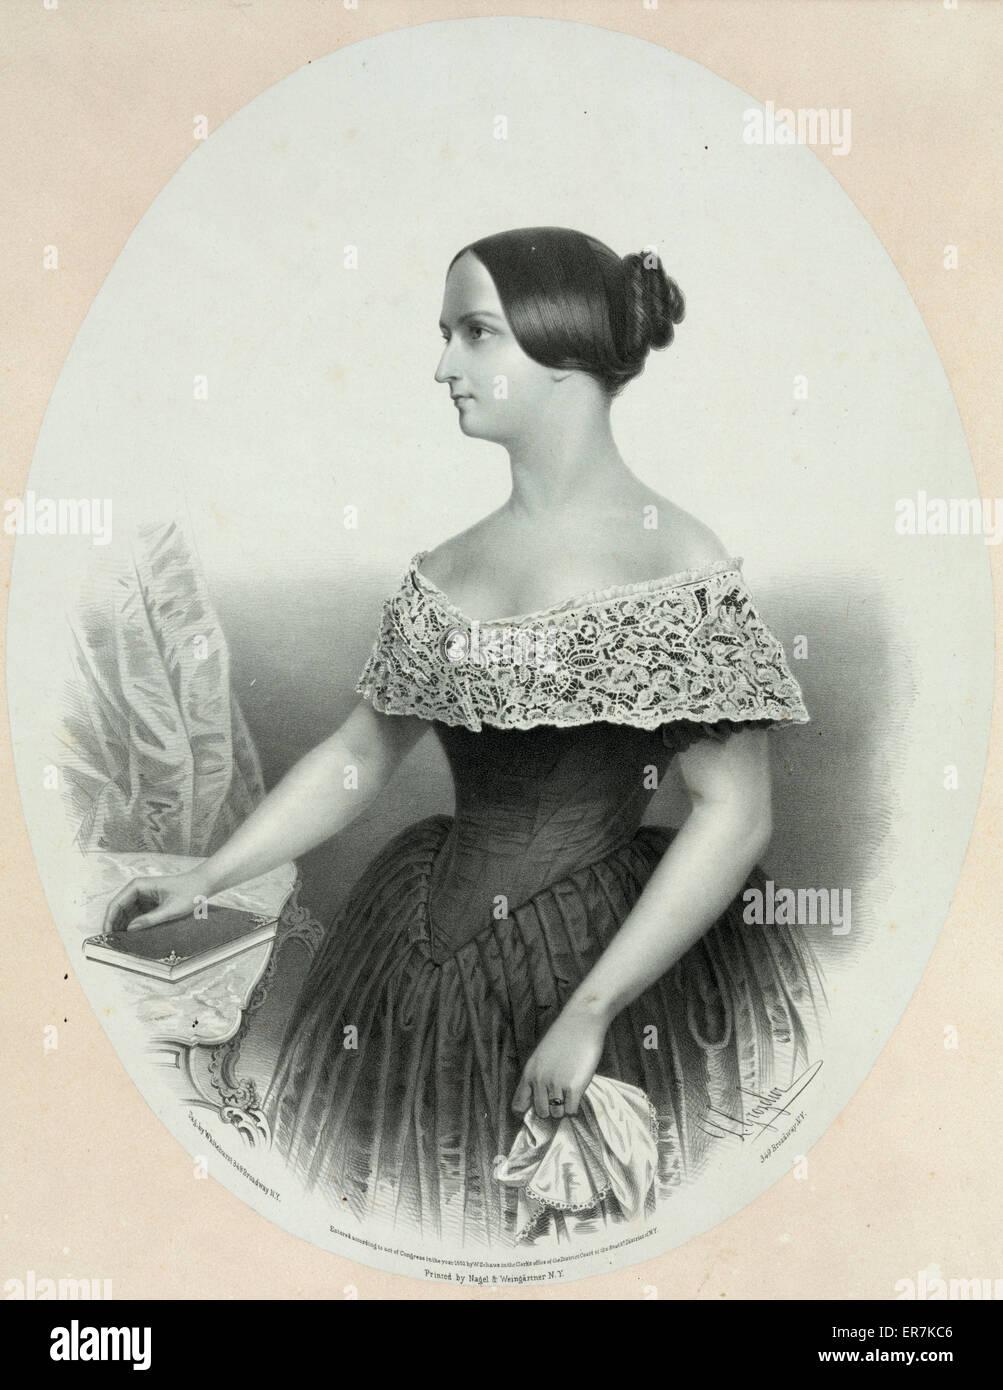 Catharine Norton Forrest. Date c1852 Jan. 27. - Stock Image